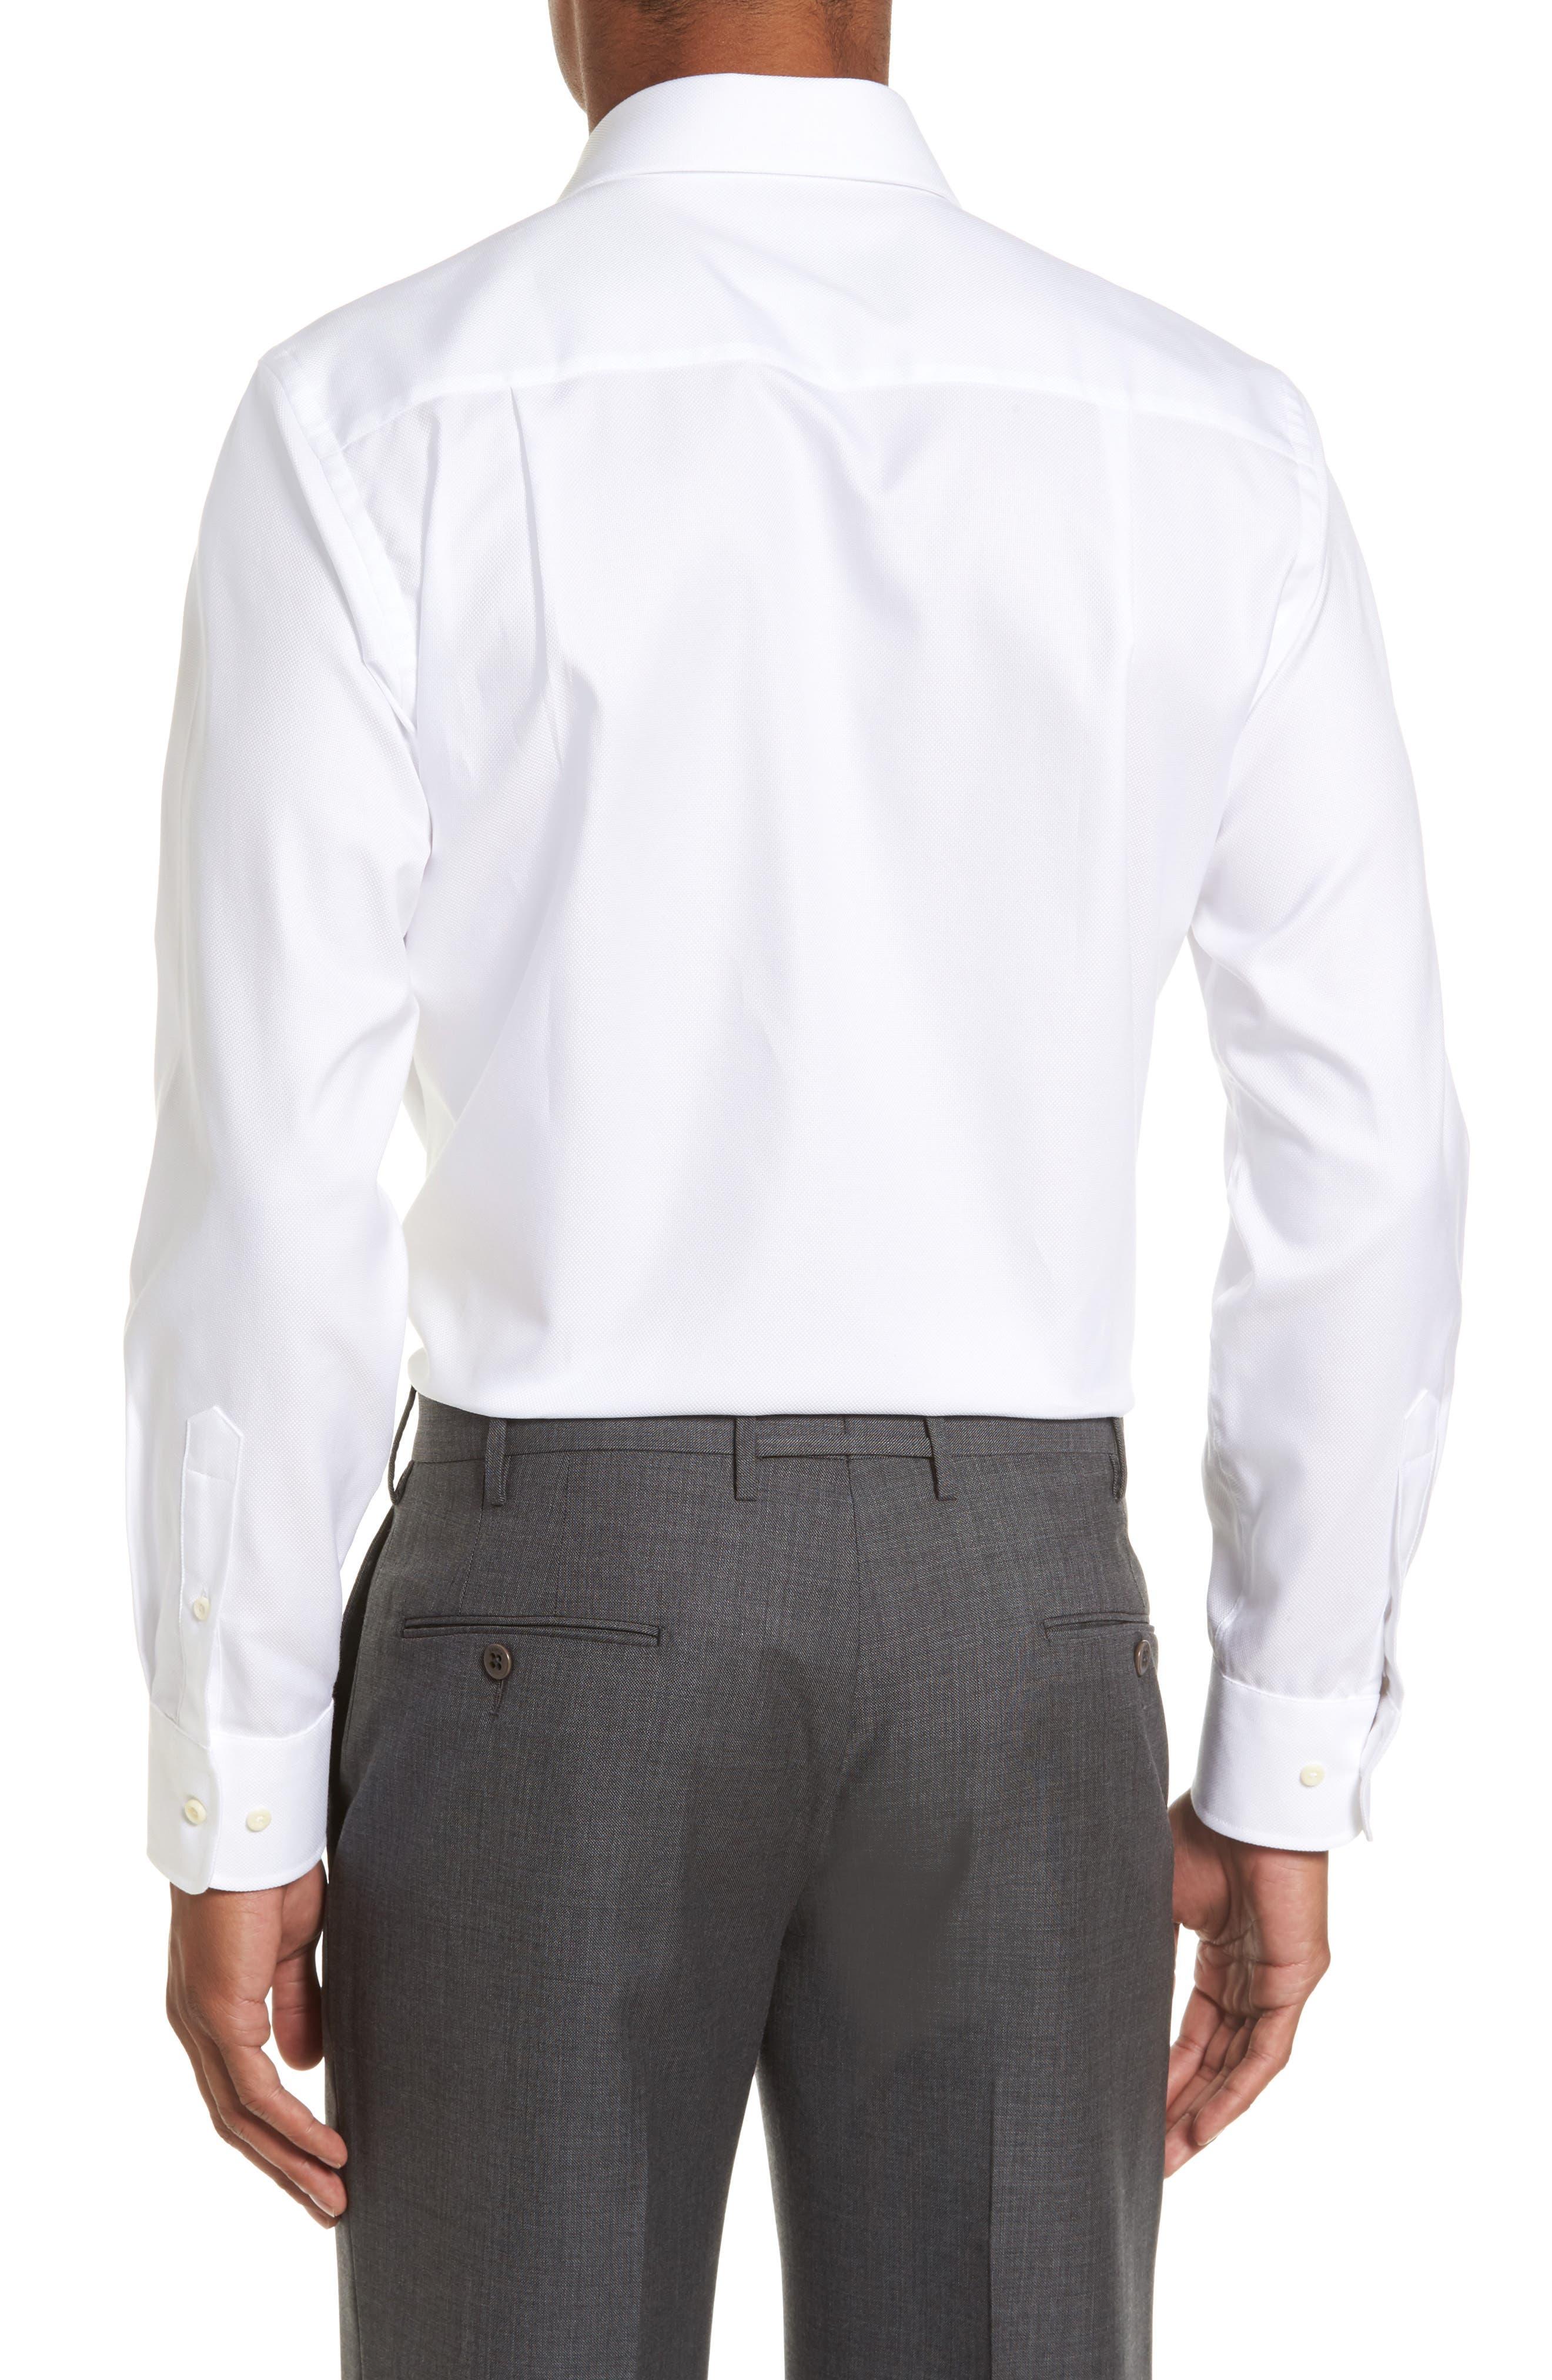 DAVID DONAHUE, Trim Fit Dress Shirt, Alternate thumbnail 2, color, WHITE